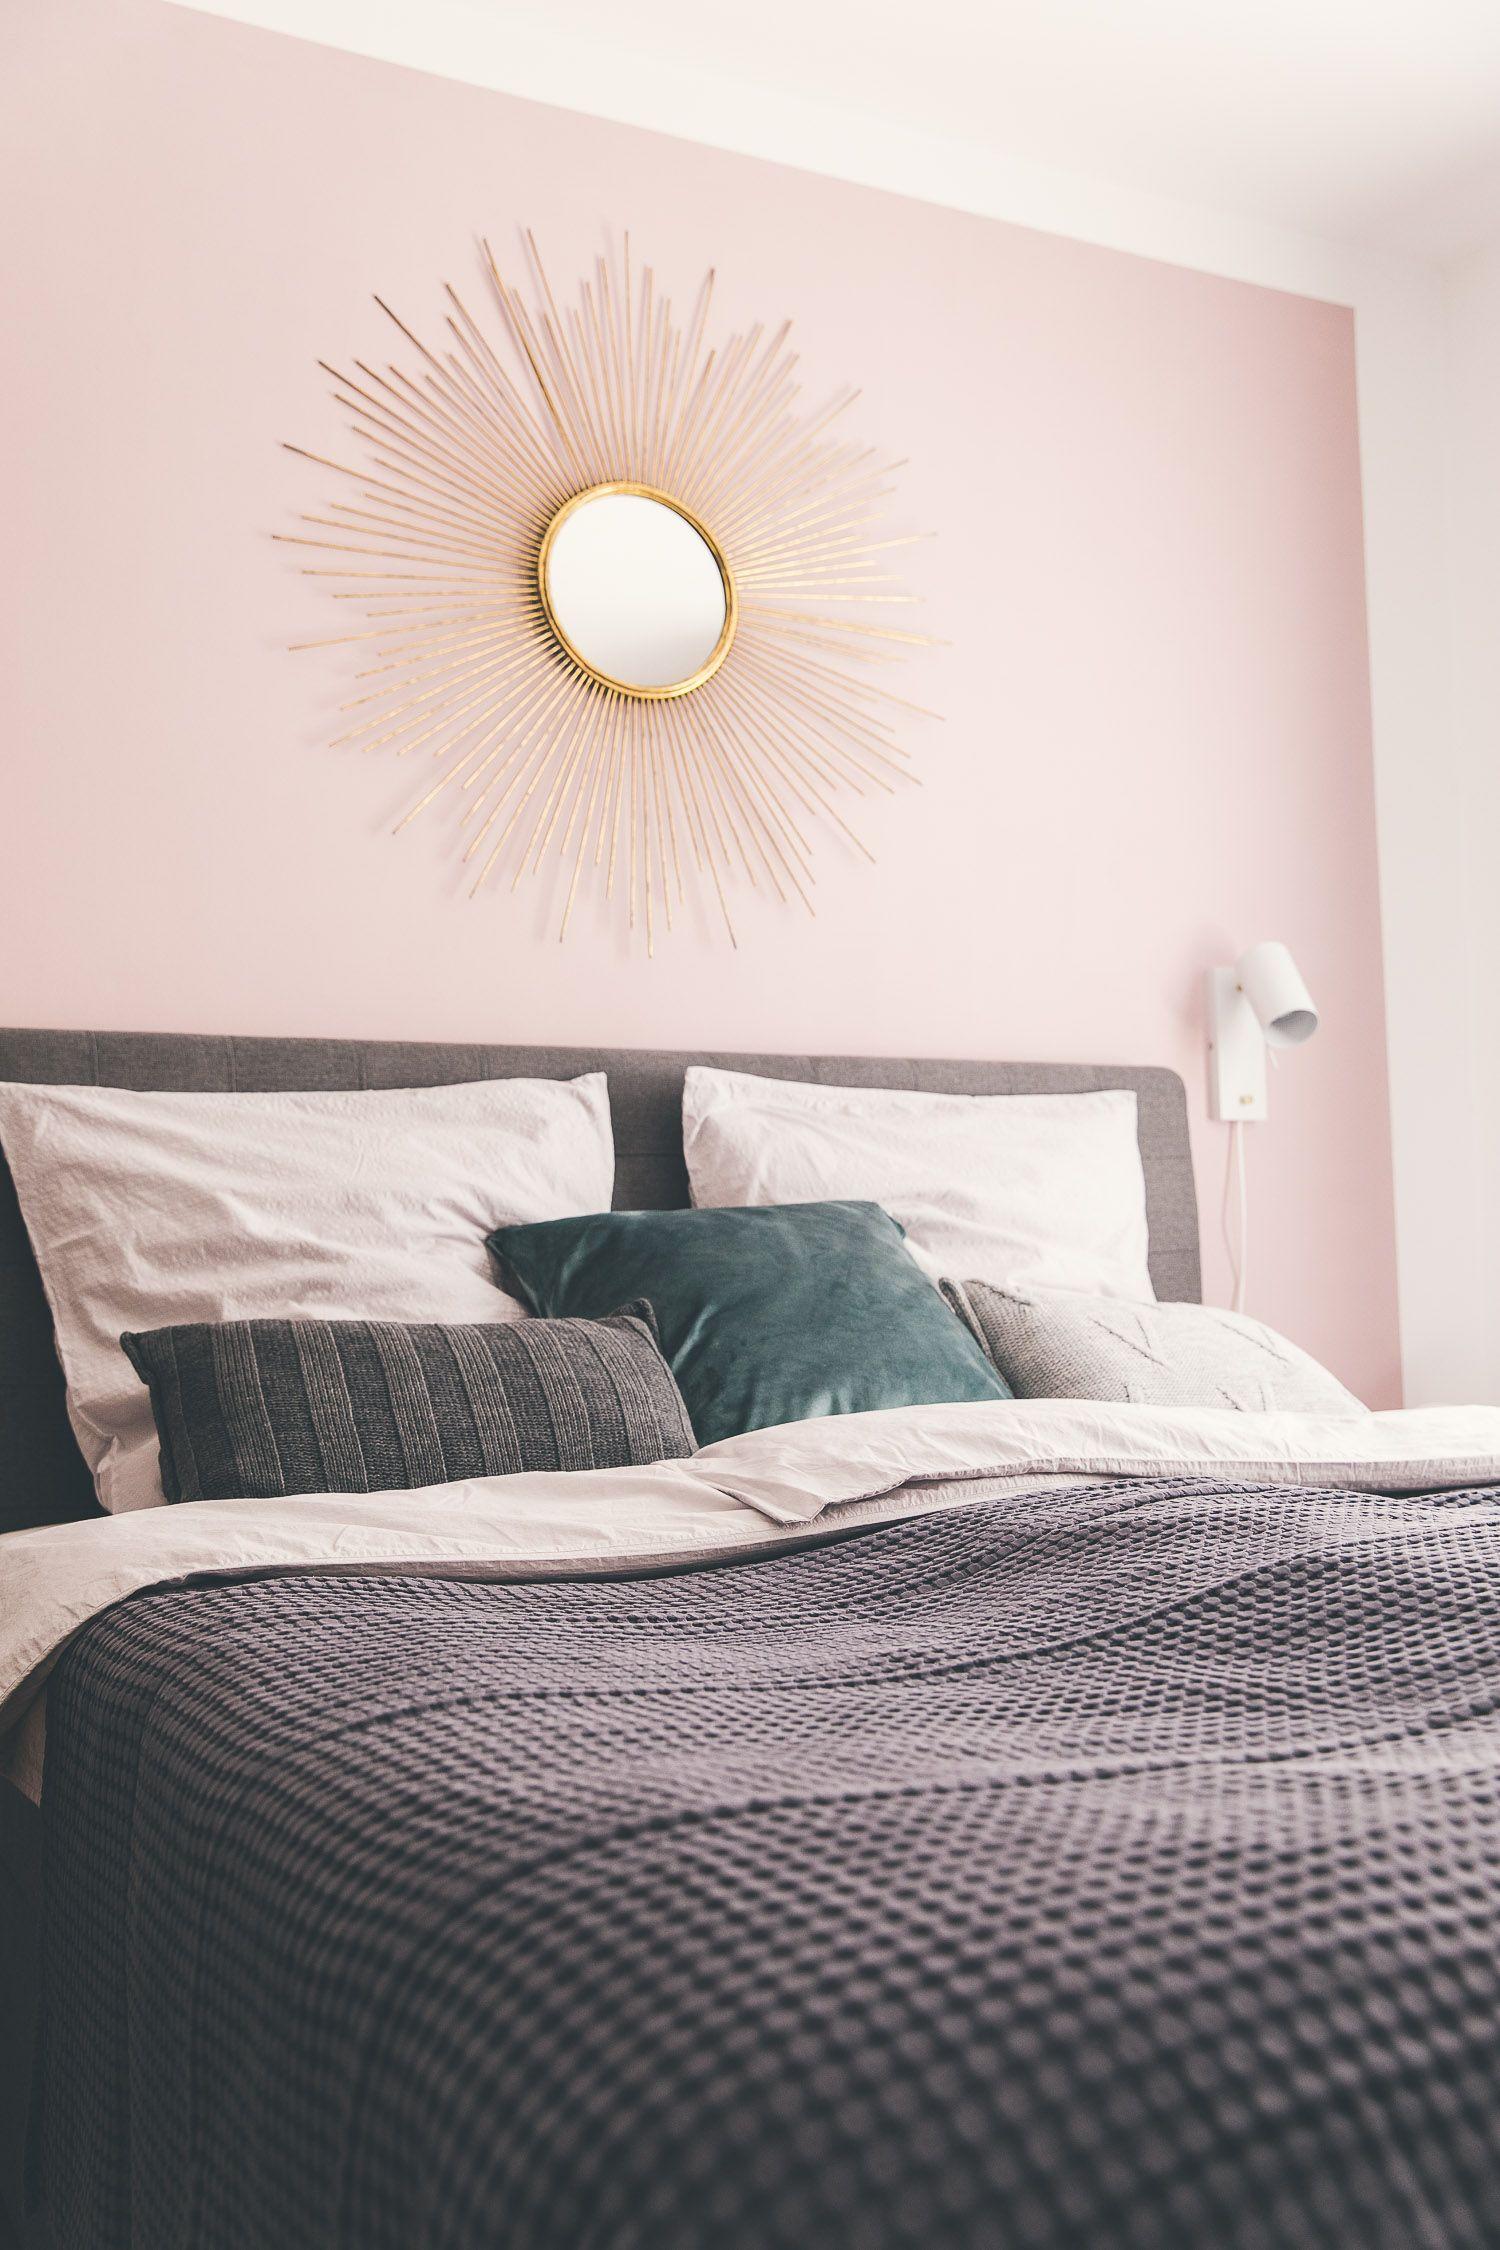 Sonnenspiegel An Rosa Wand Im Schlafzimmer Schlafzimmer Wand Schlafzimmerfarbe Rosa Wande